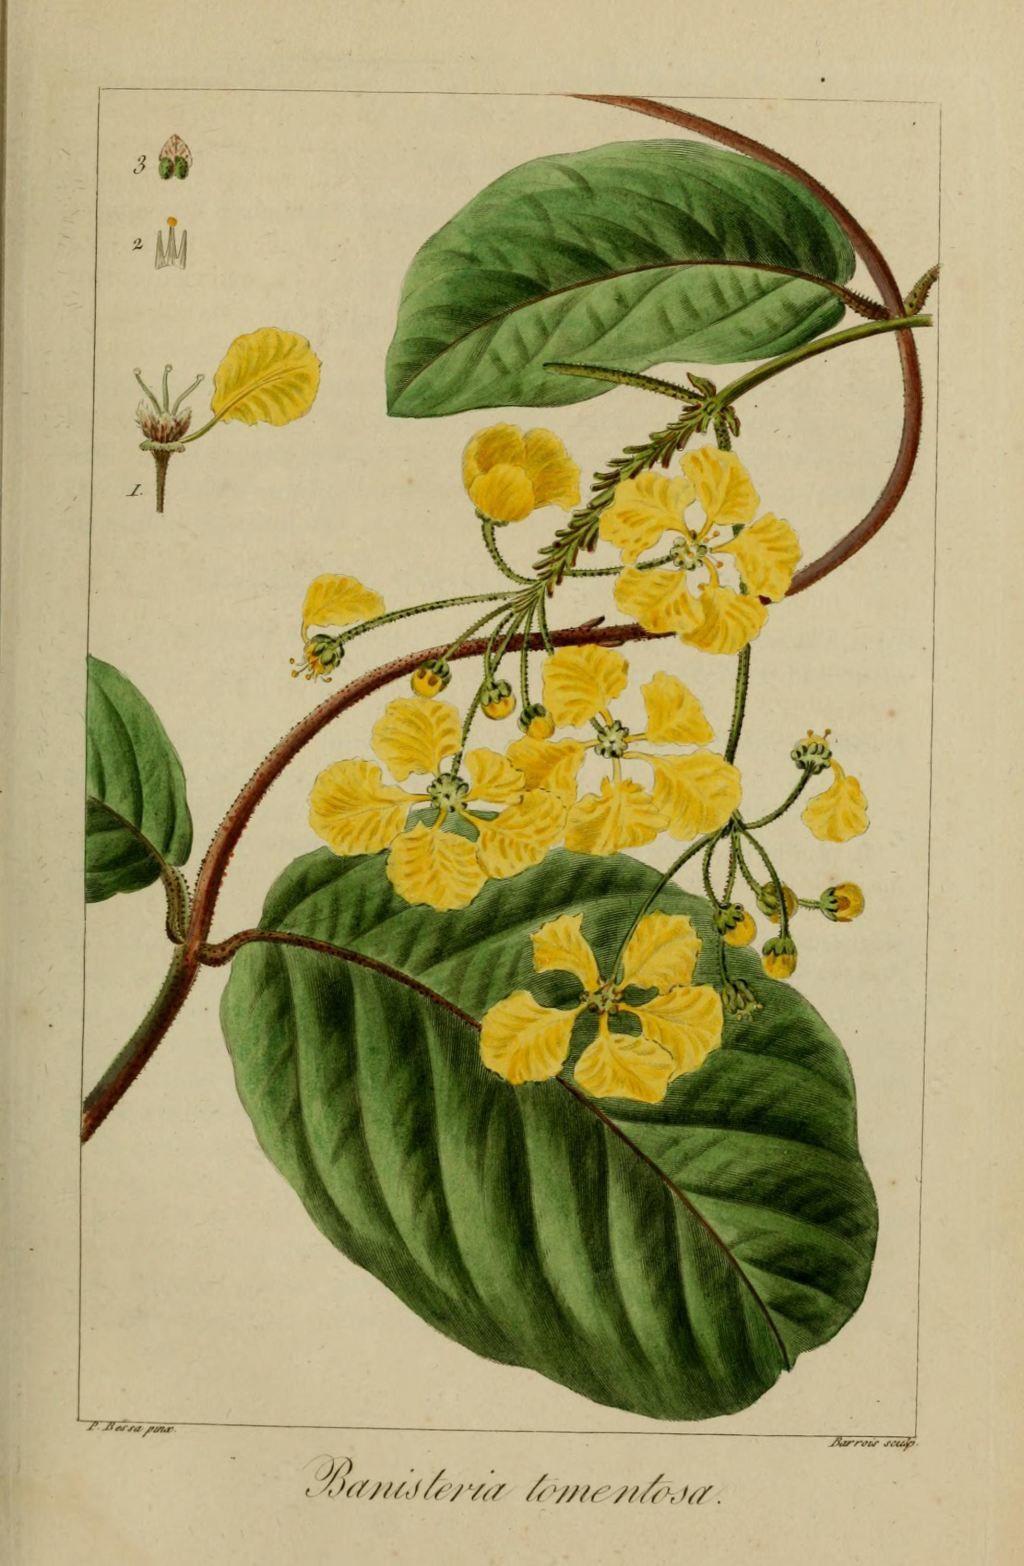 50035 banisteria cotonneux - banisteria tomentosa